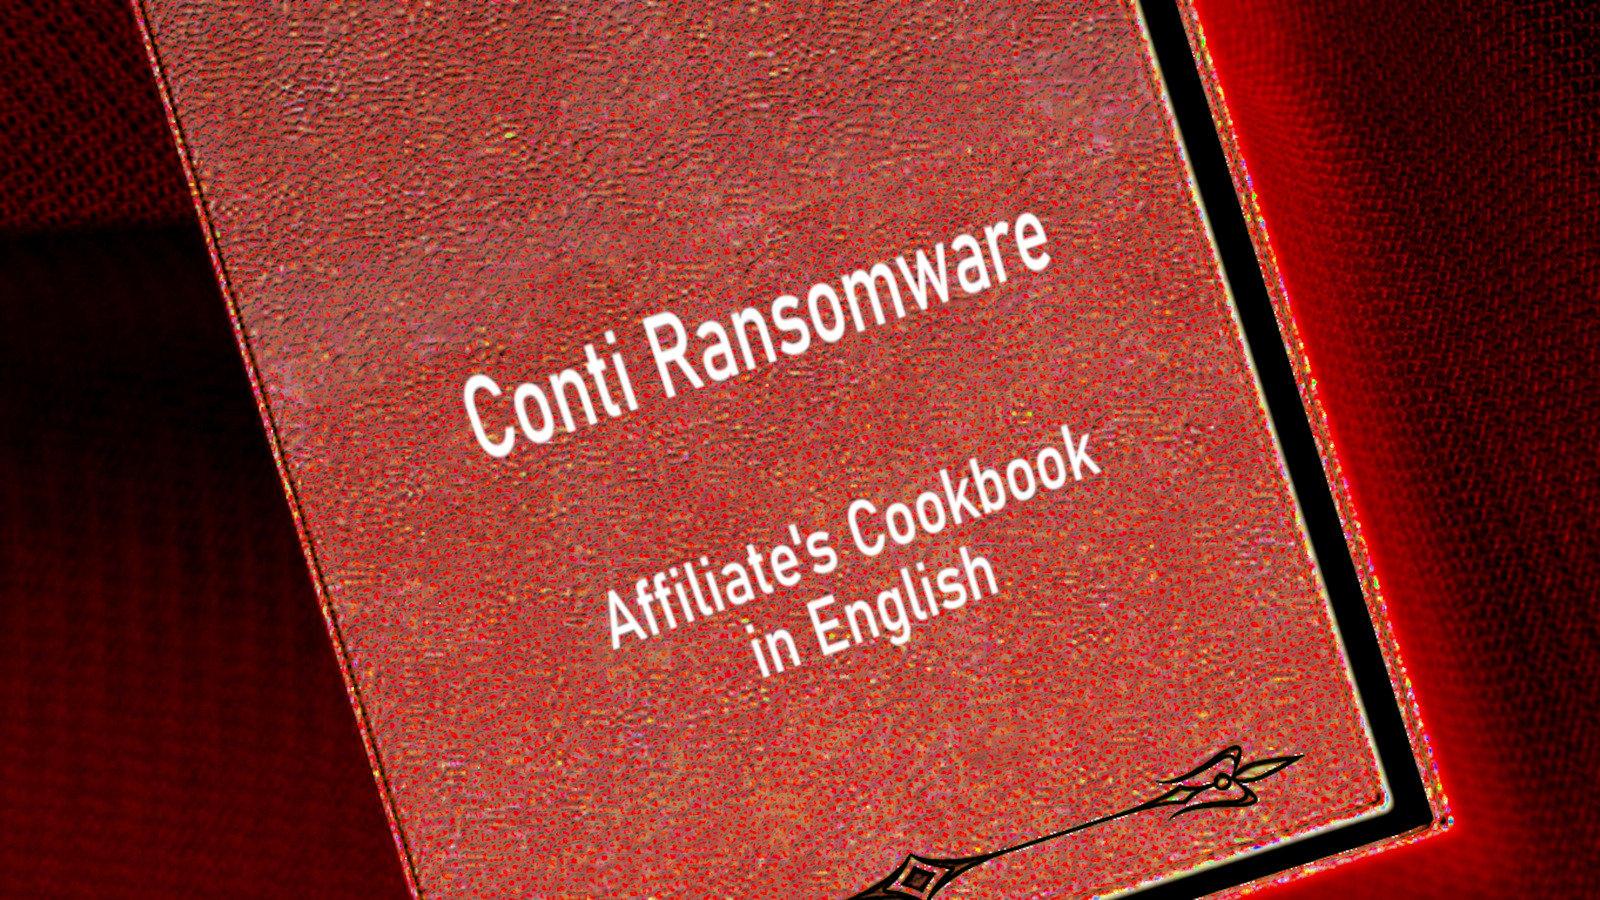 Conti ransomware affiliate's cookbook in English